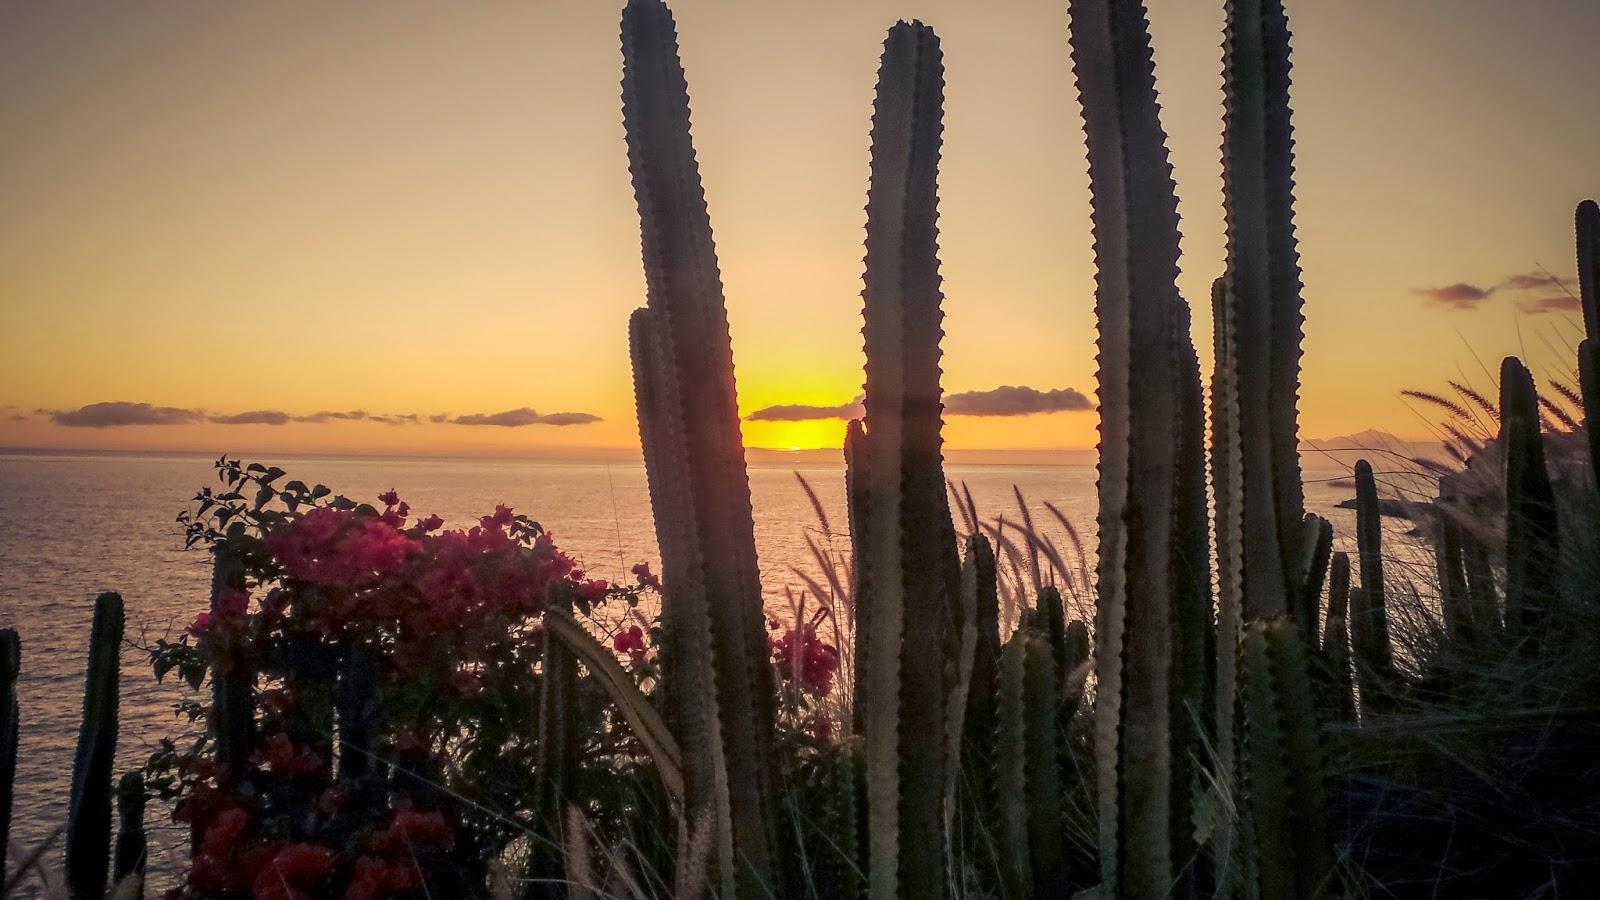 amadores sunset, gran canaria, travel photography, mandy charlton